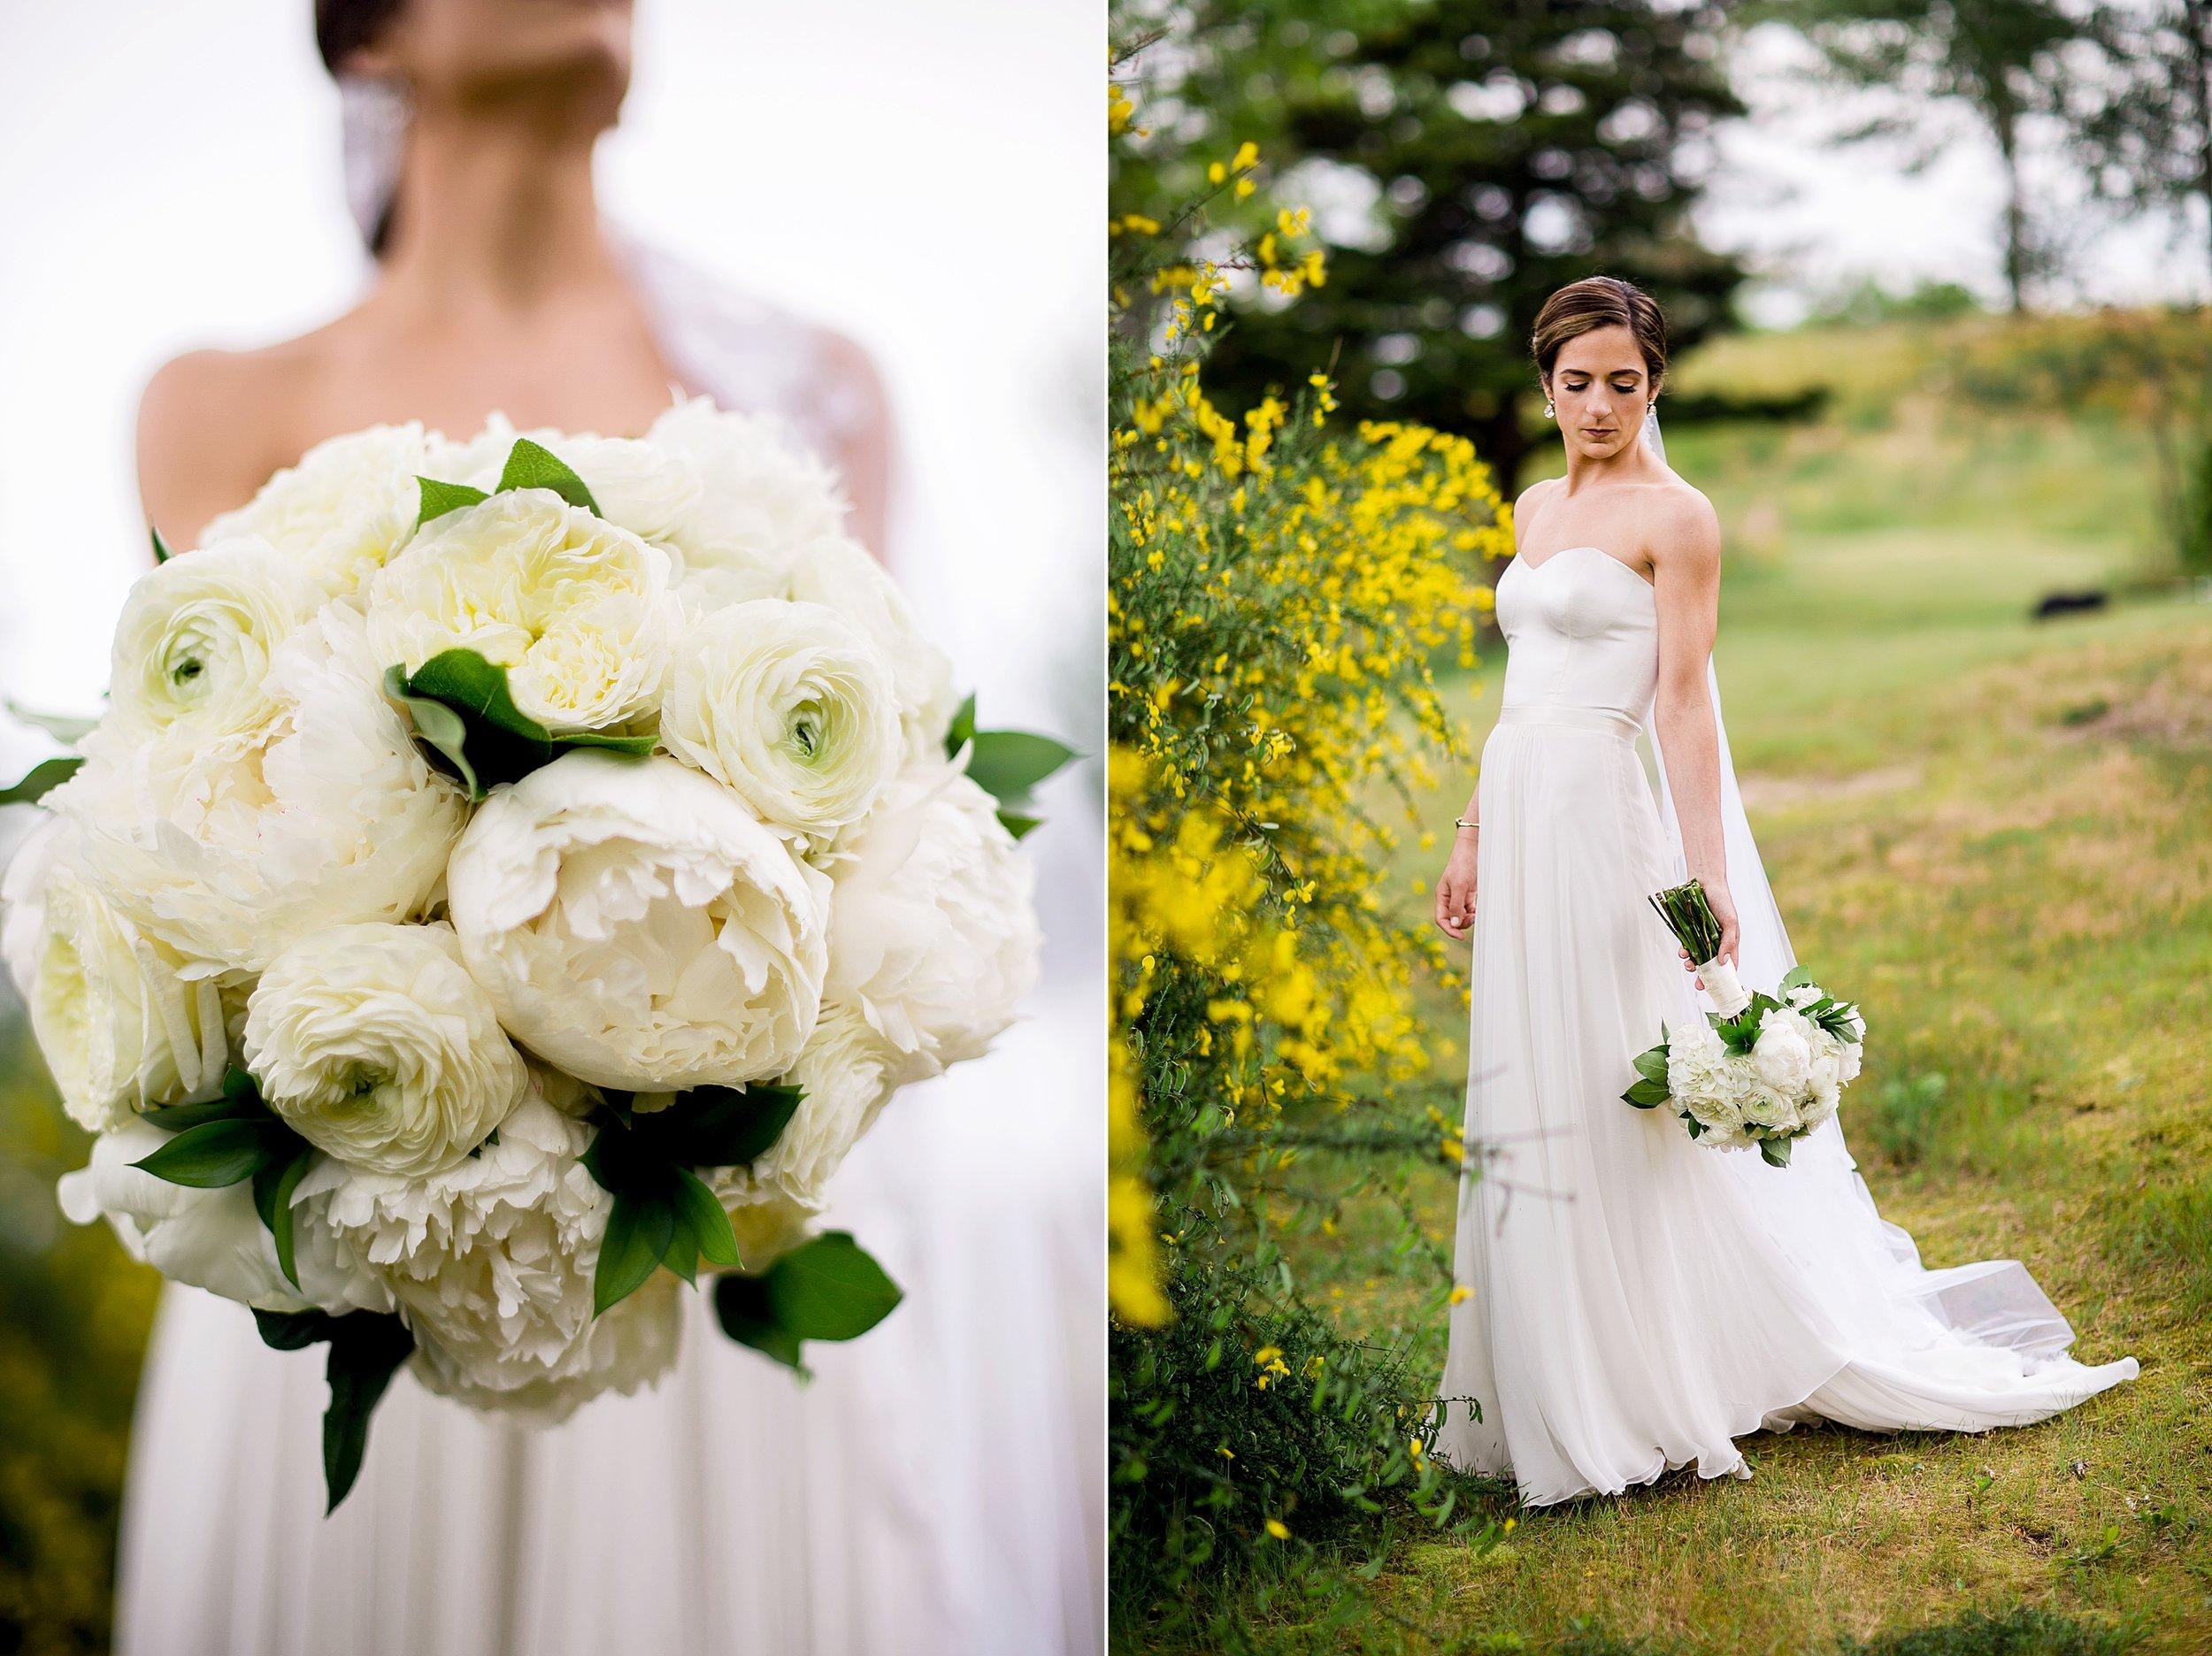 019 los angeles wedding photographer todd danforth photography cape cod.jpg